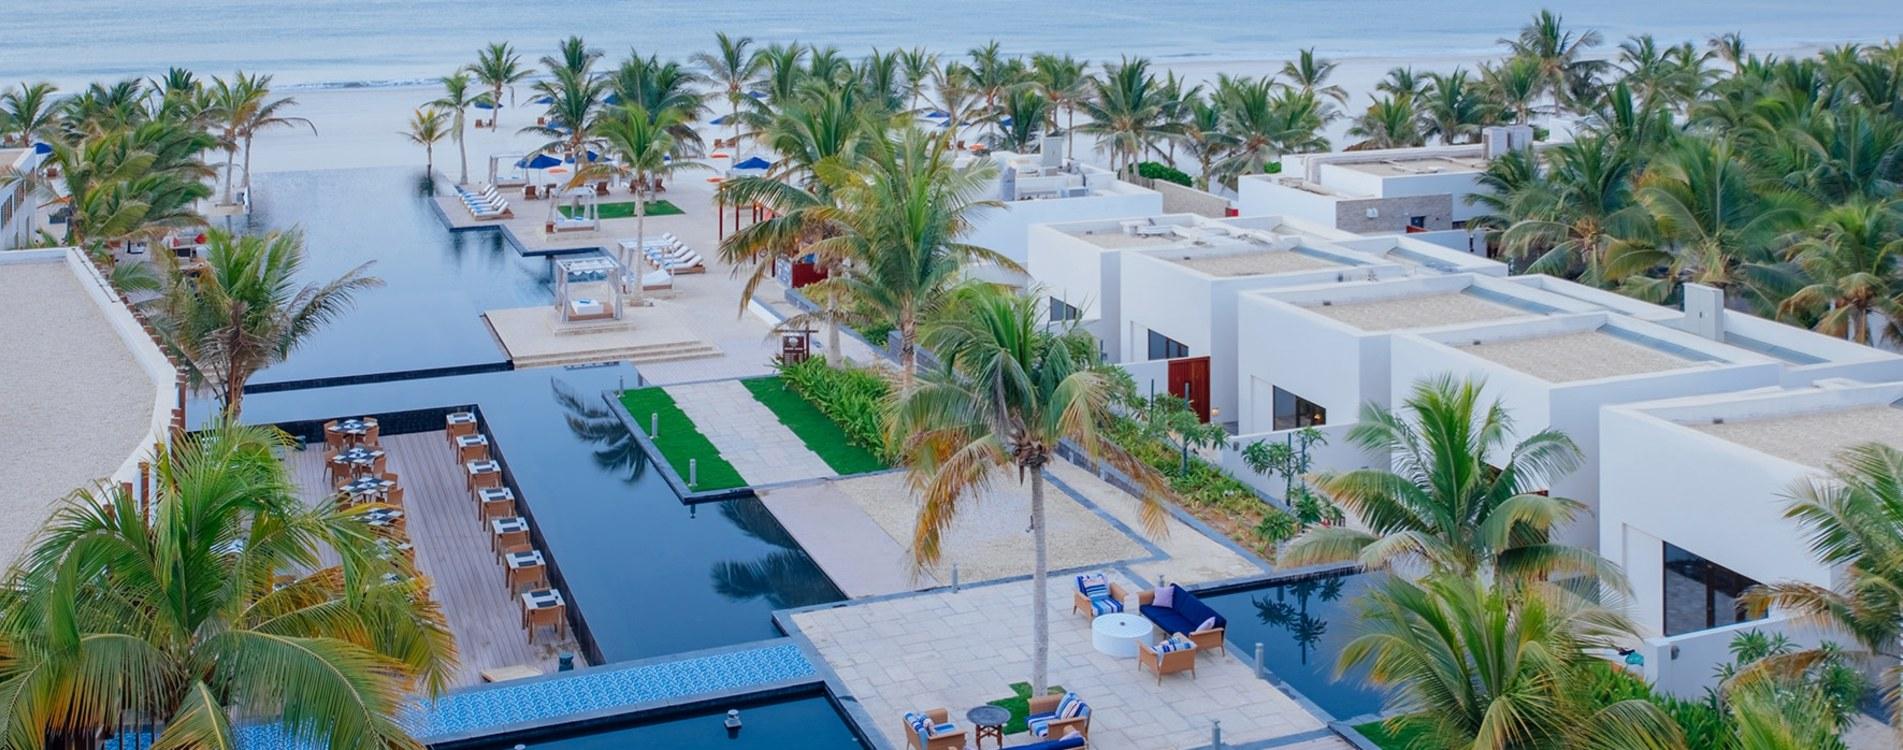 Al-Baleed-Resort-Salalah-By-Anantara-Pool-Luftbildaufnahme-Oman.jpg